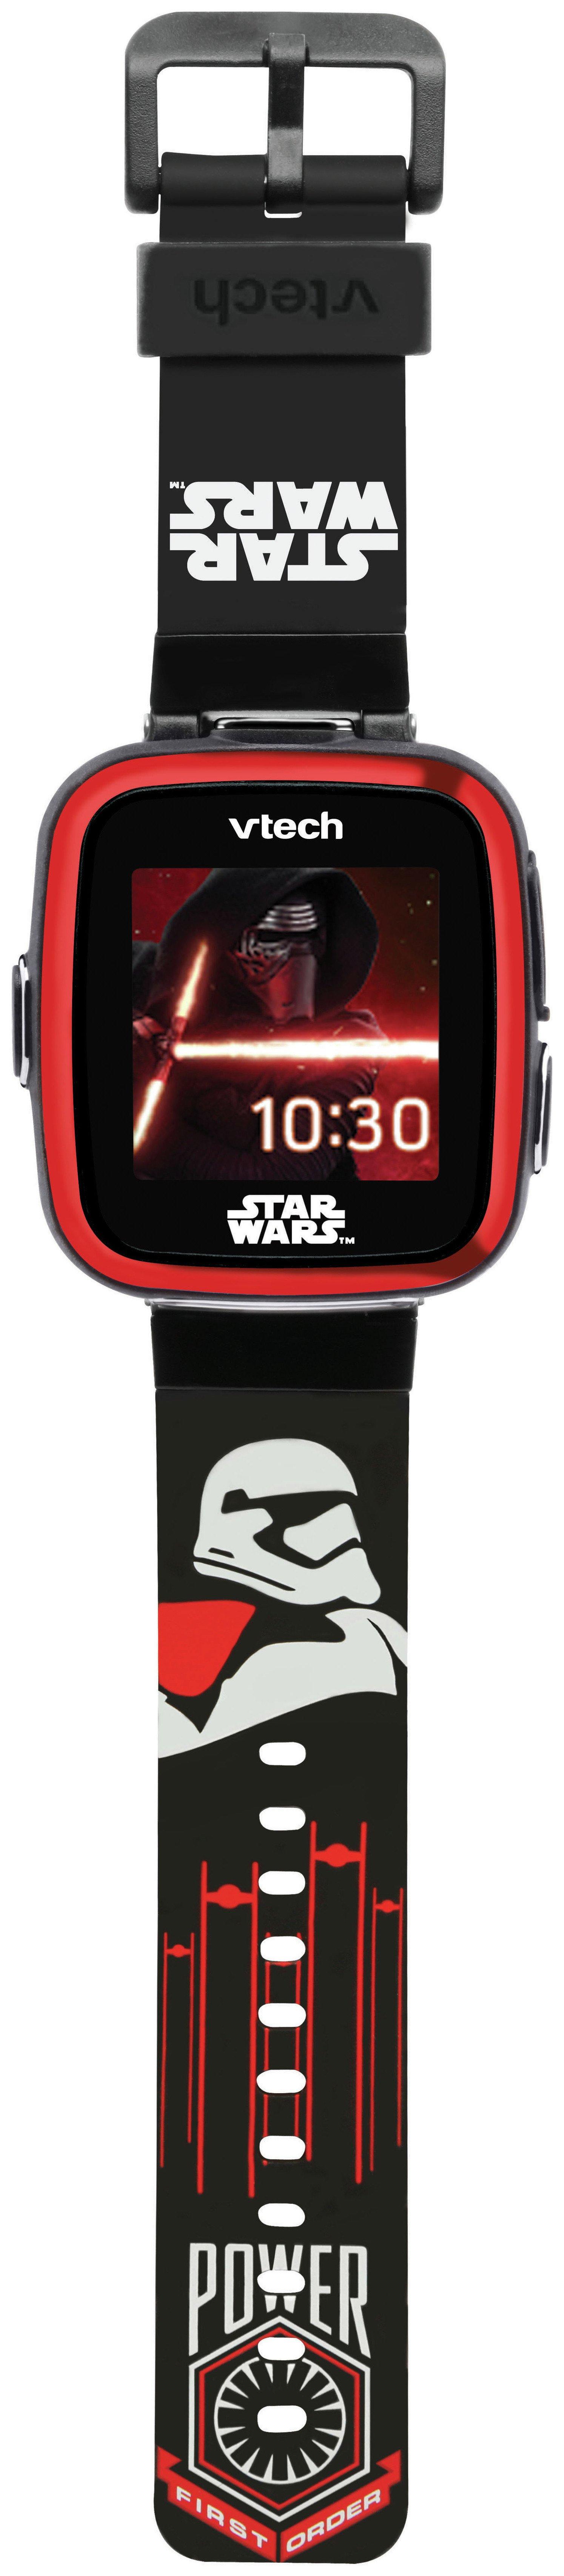 VTech Star Wars Storm Trooper Watch